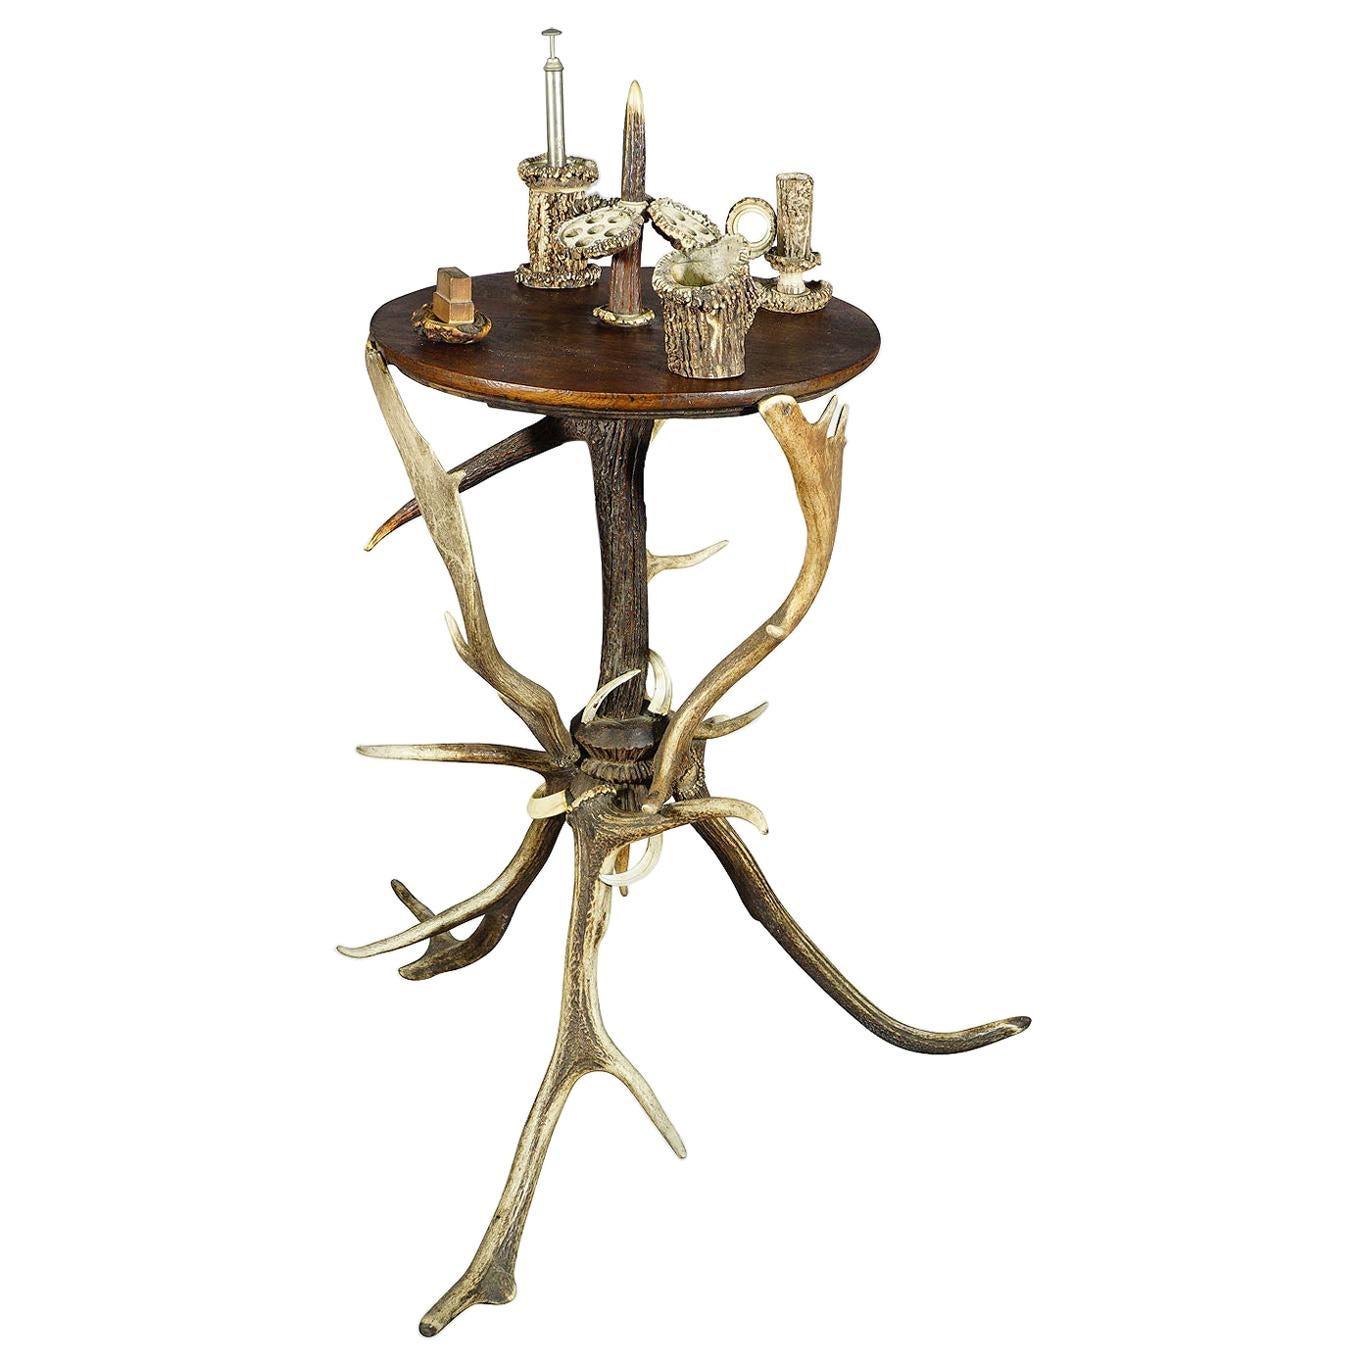 Elaborate Handmade Black Forest Style Antler Smoking Table, circa 1900